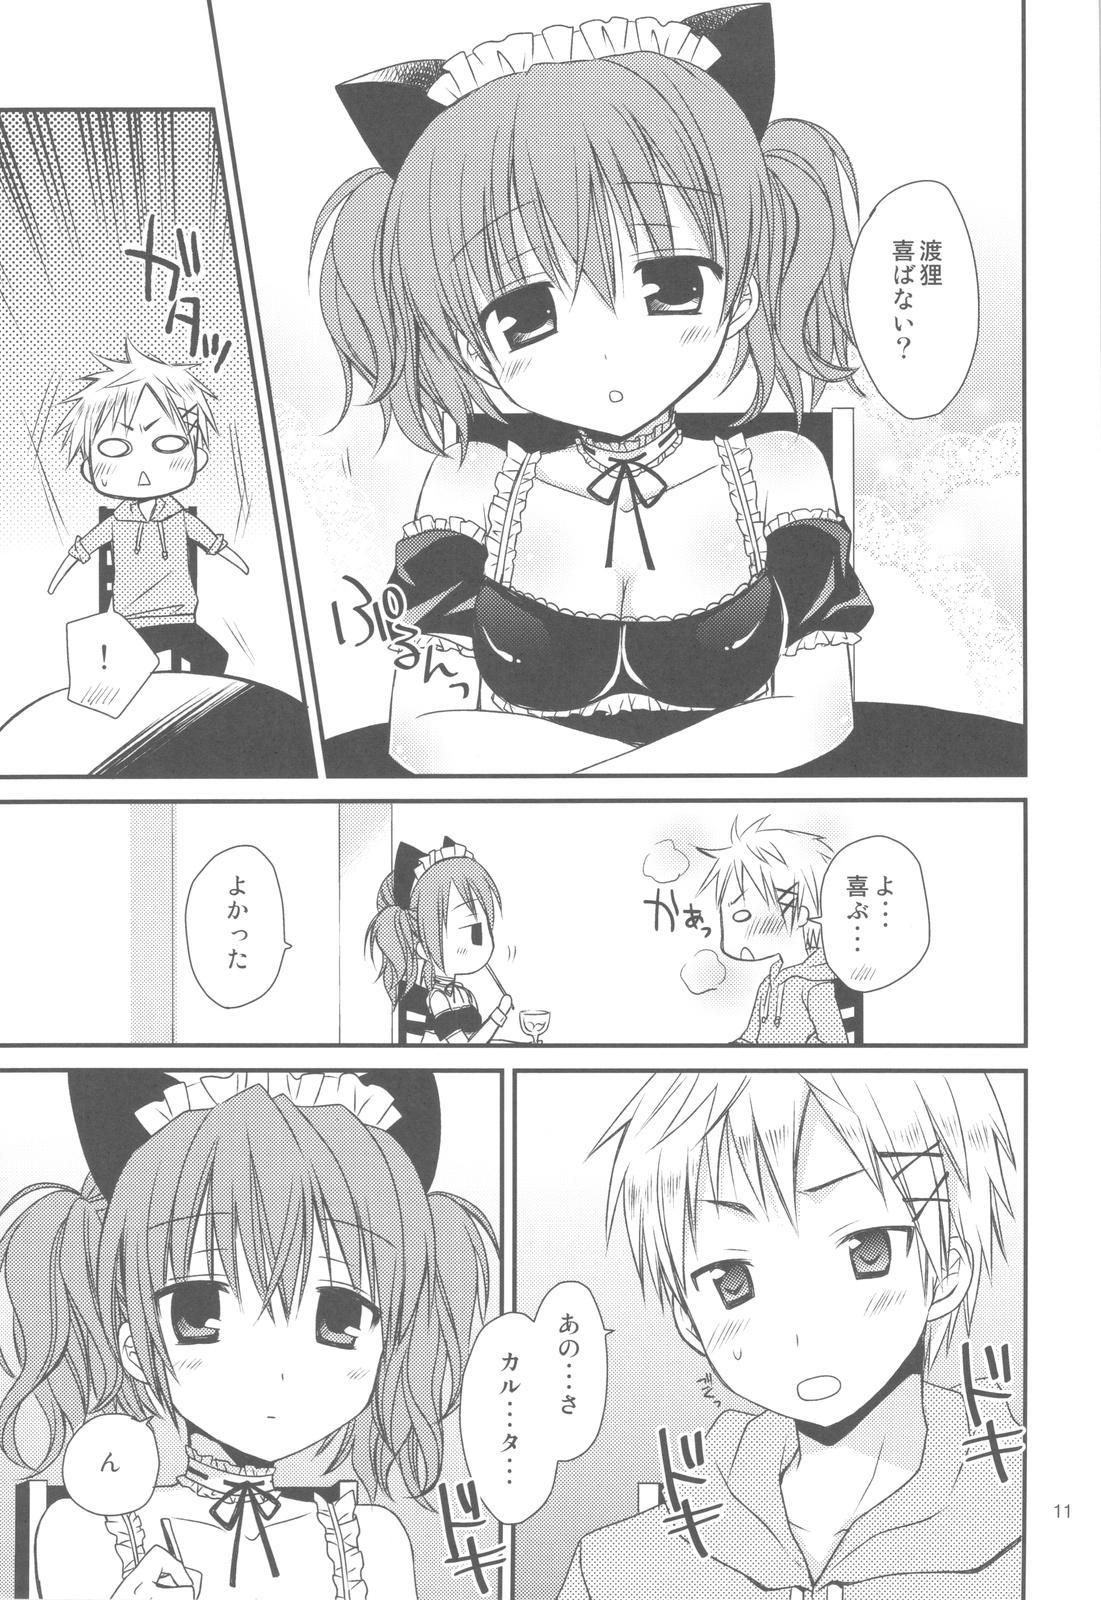 Chiisana Ai no Monogatari 9